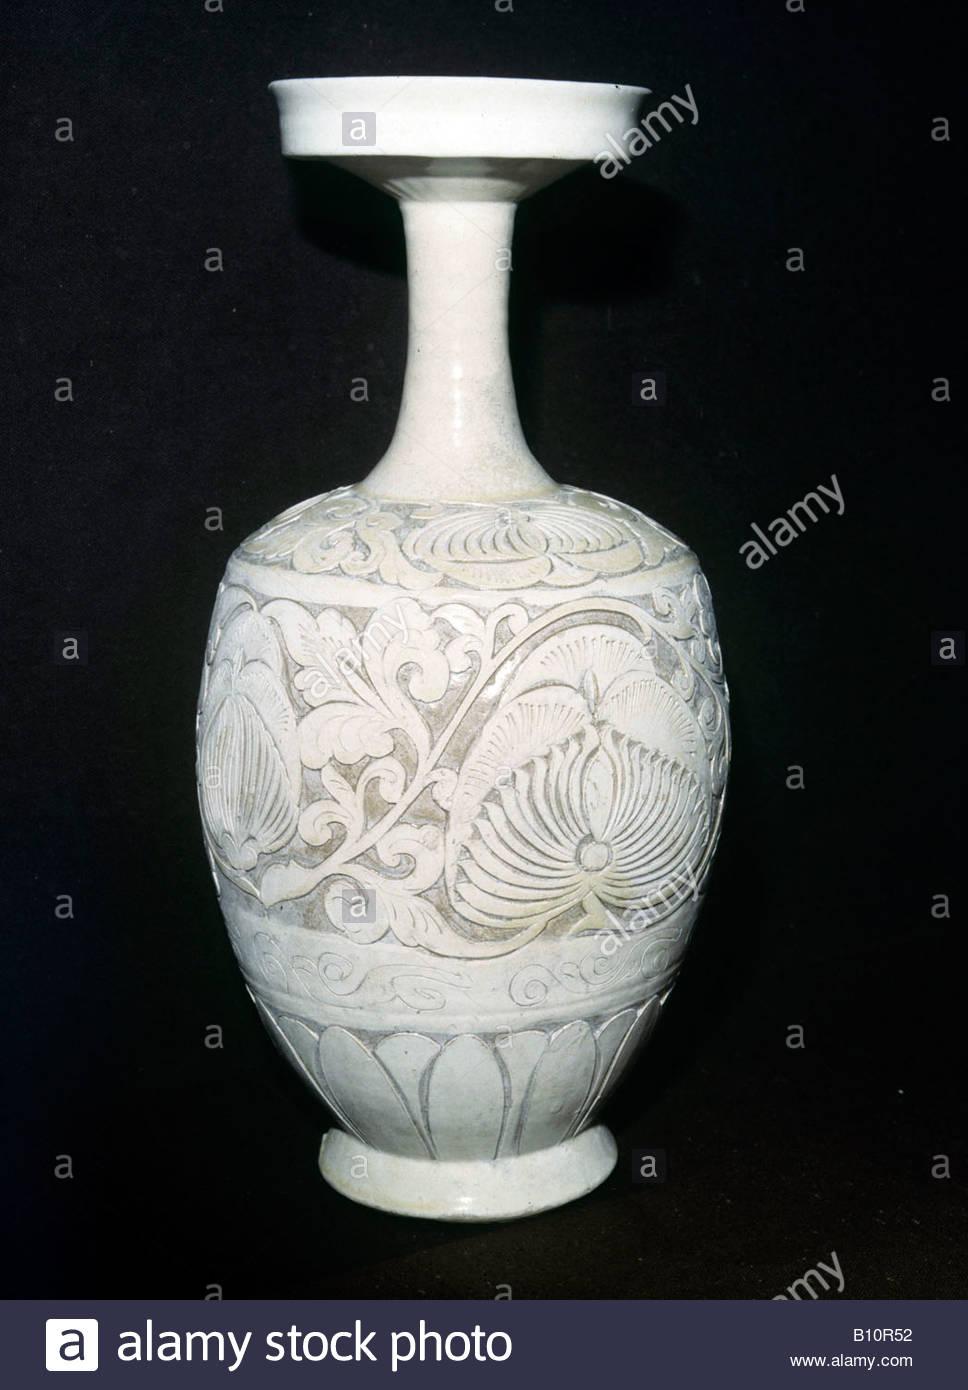 Vase chinois de la Dynastie Sung Teng Feng Honan Tzu type Choe 11e c annonce Copyright: Collection AAA Ltd Photo Stock